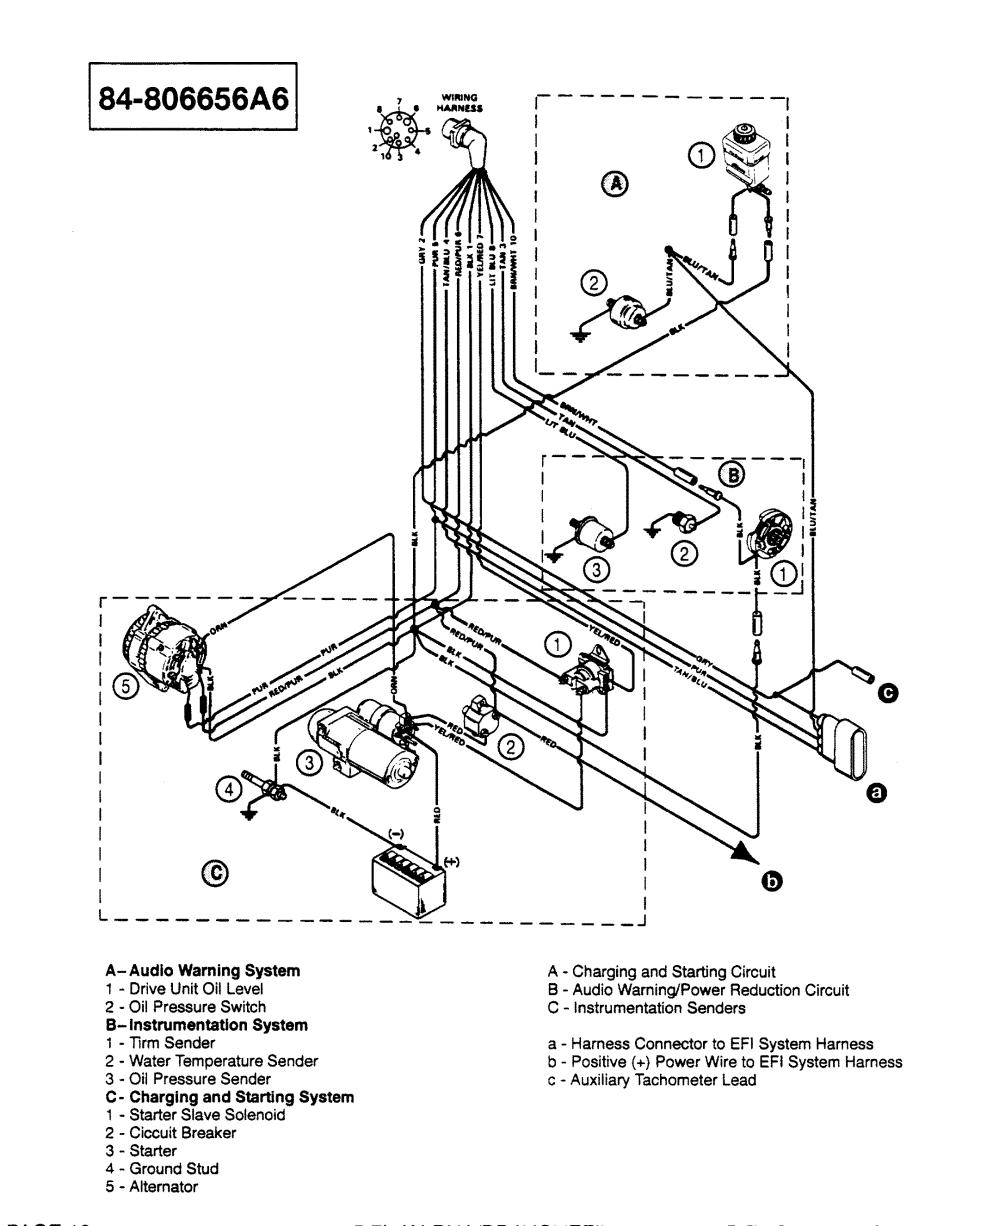 medium resolution of 5 7l bravo efi tbi gm 350 v 8 1995 serial 0f225560 thru 0f752399 wiring harness engine illustration only